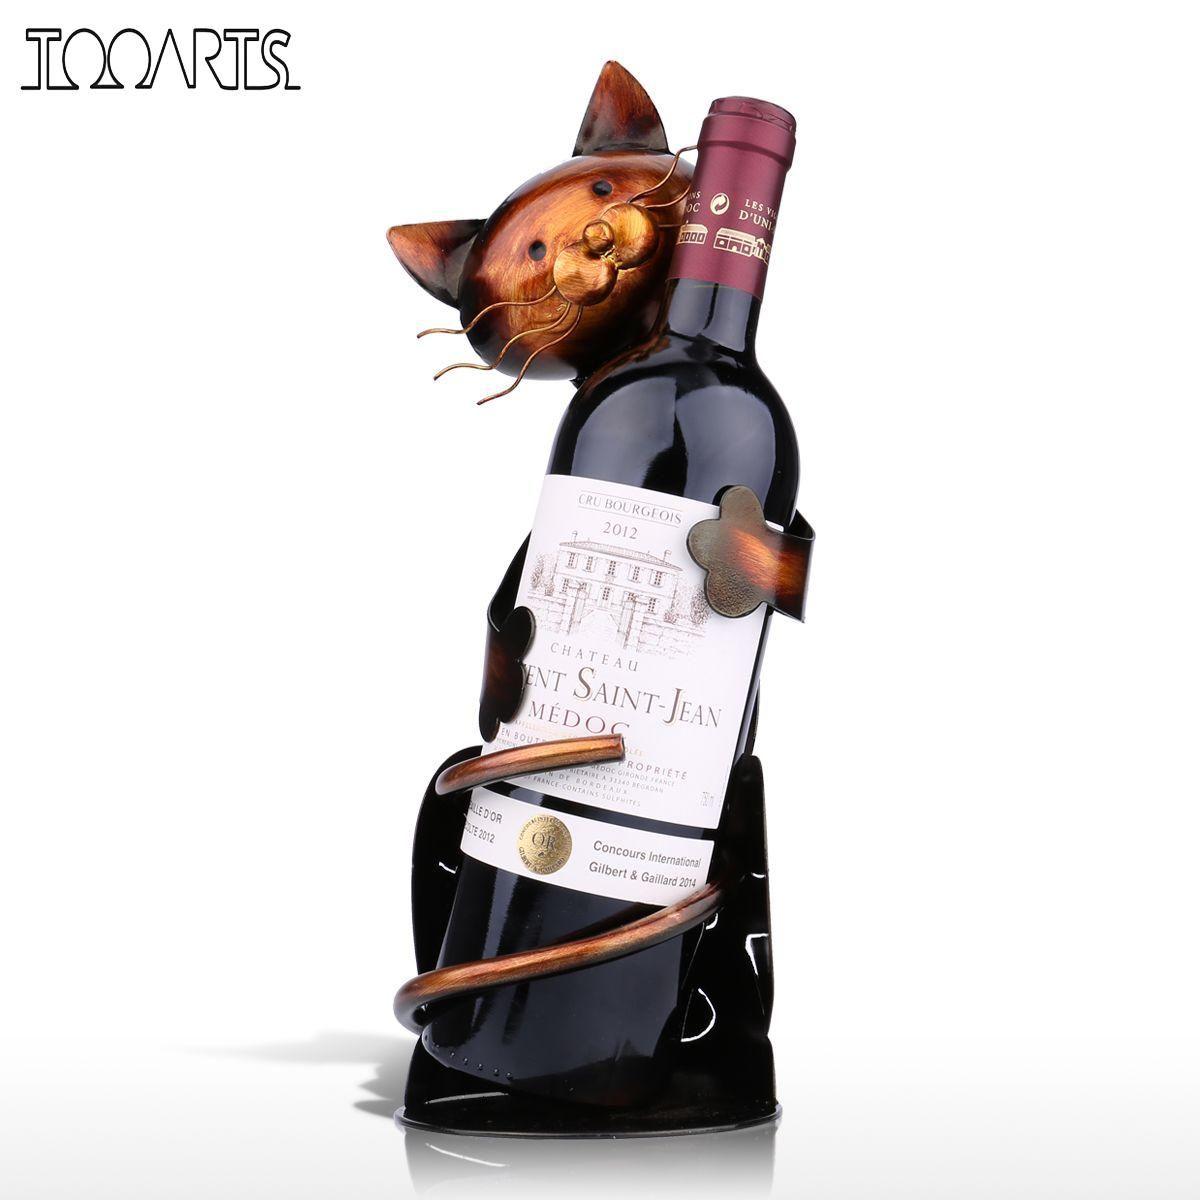 TOOARTS Cat Wine Rack Wine Holder Shelf Metal Sculpture Practical Sculpture Wine stand Home Decoration Interior Crafts